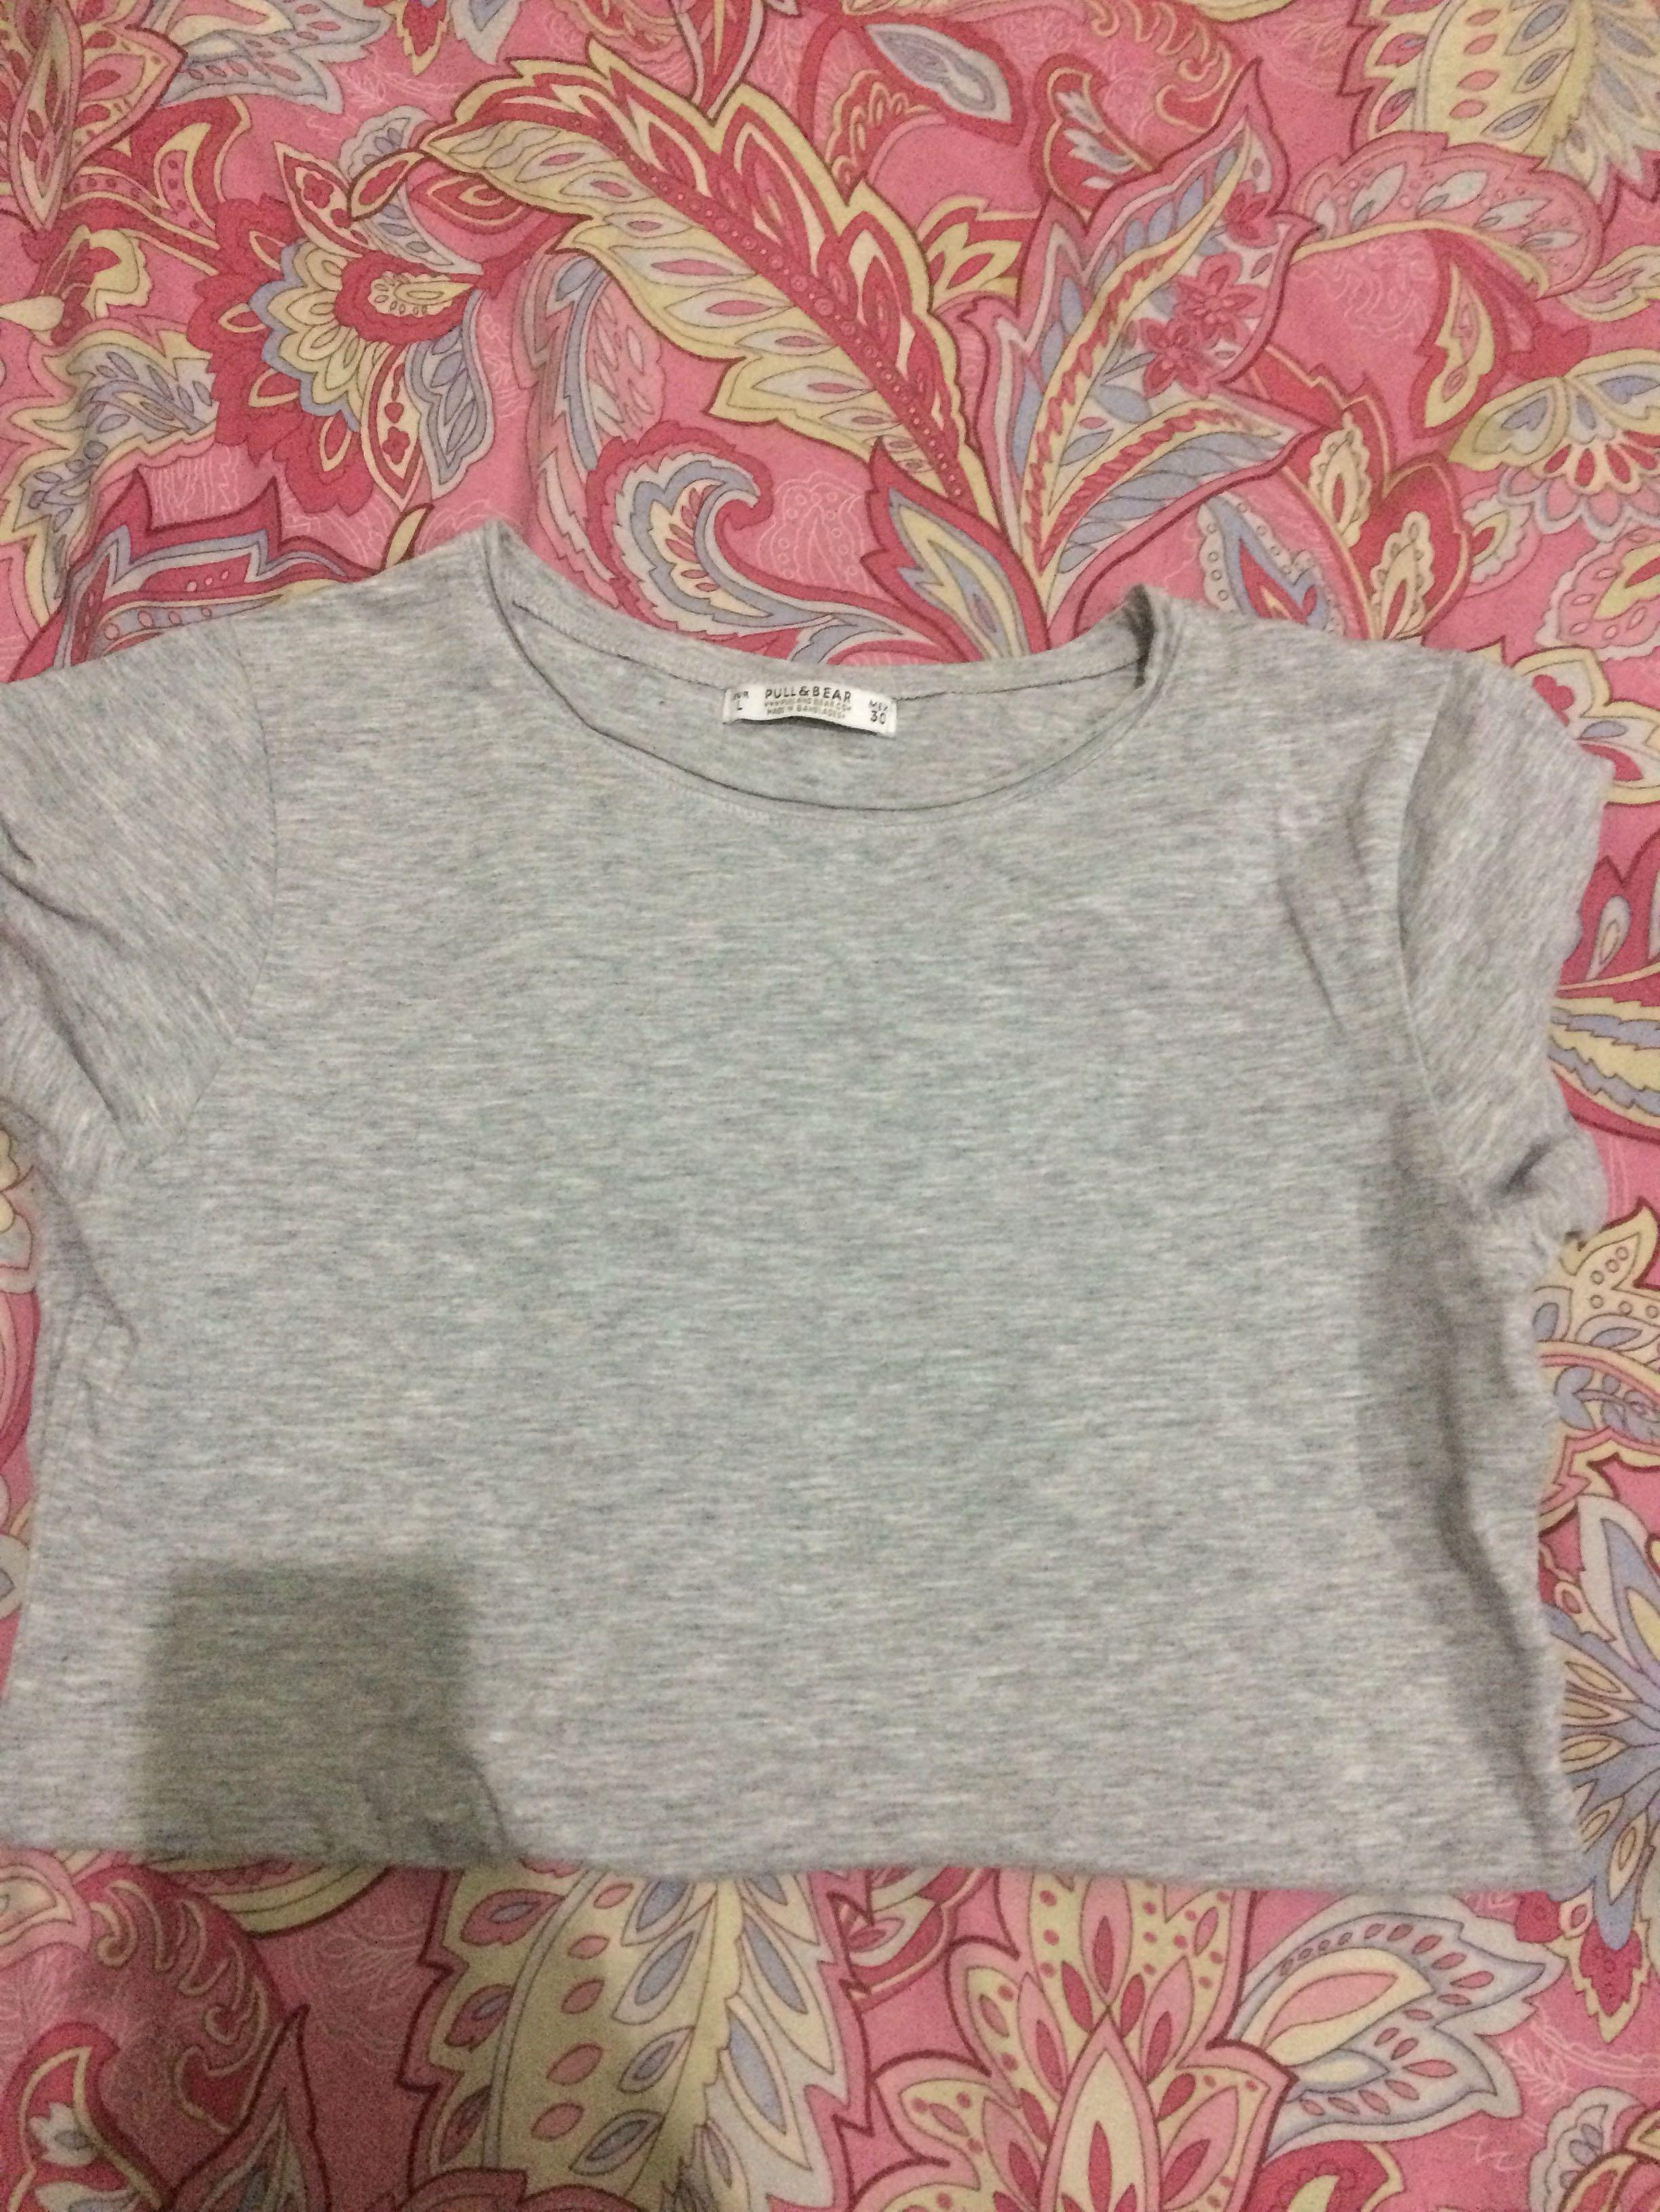 Pull & bear grey tshirt